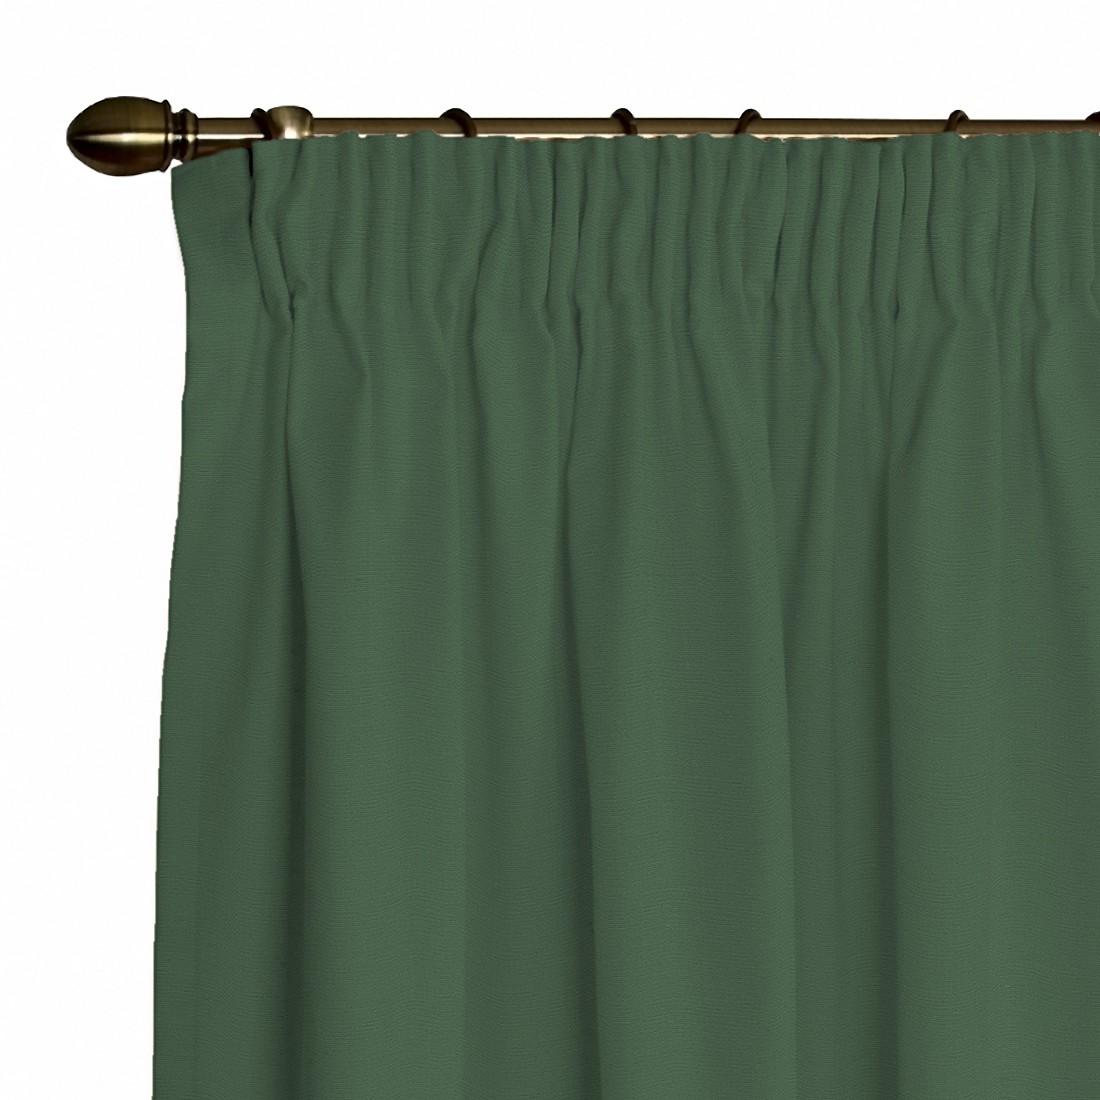 Image of Tenda Cotton Panama (incl. fettuccia arricciatende) - Verde abete - 130 x 260 cm, Dekoria